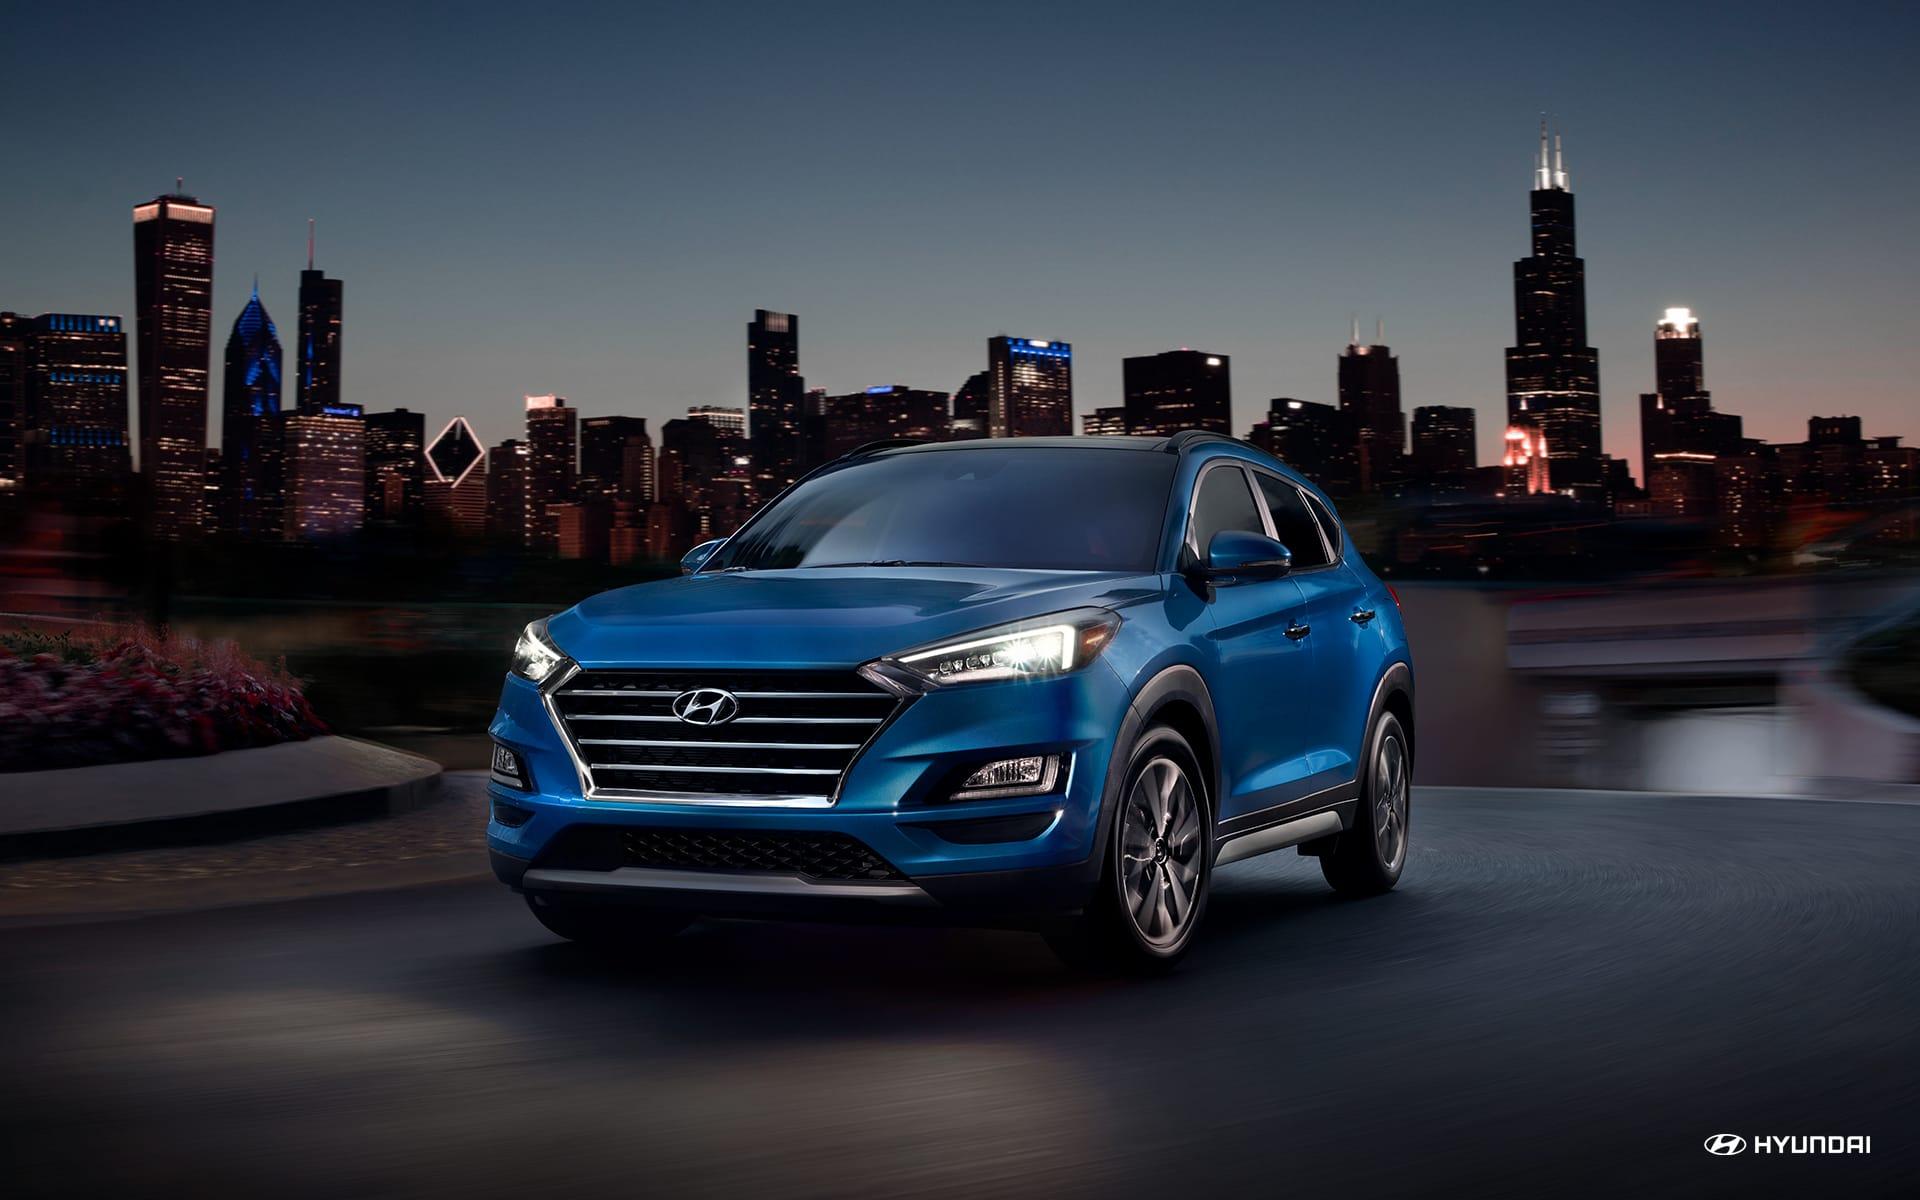 Test Drive the Hyundai Tucson!